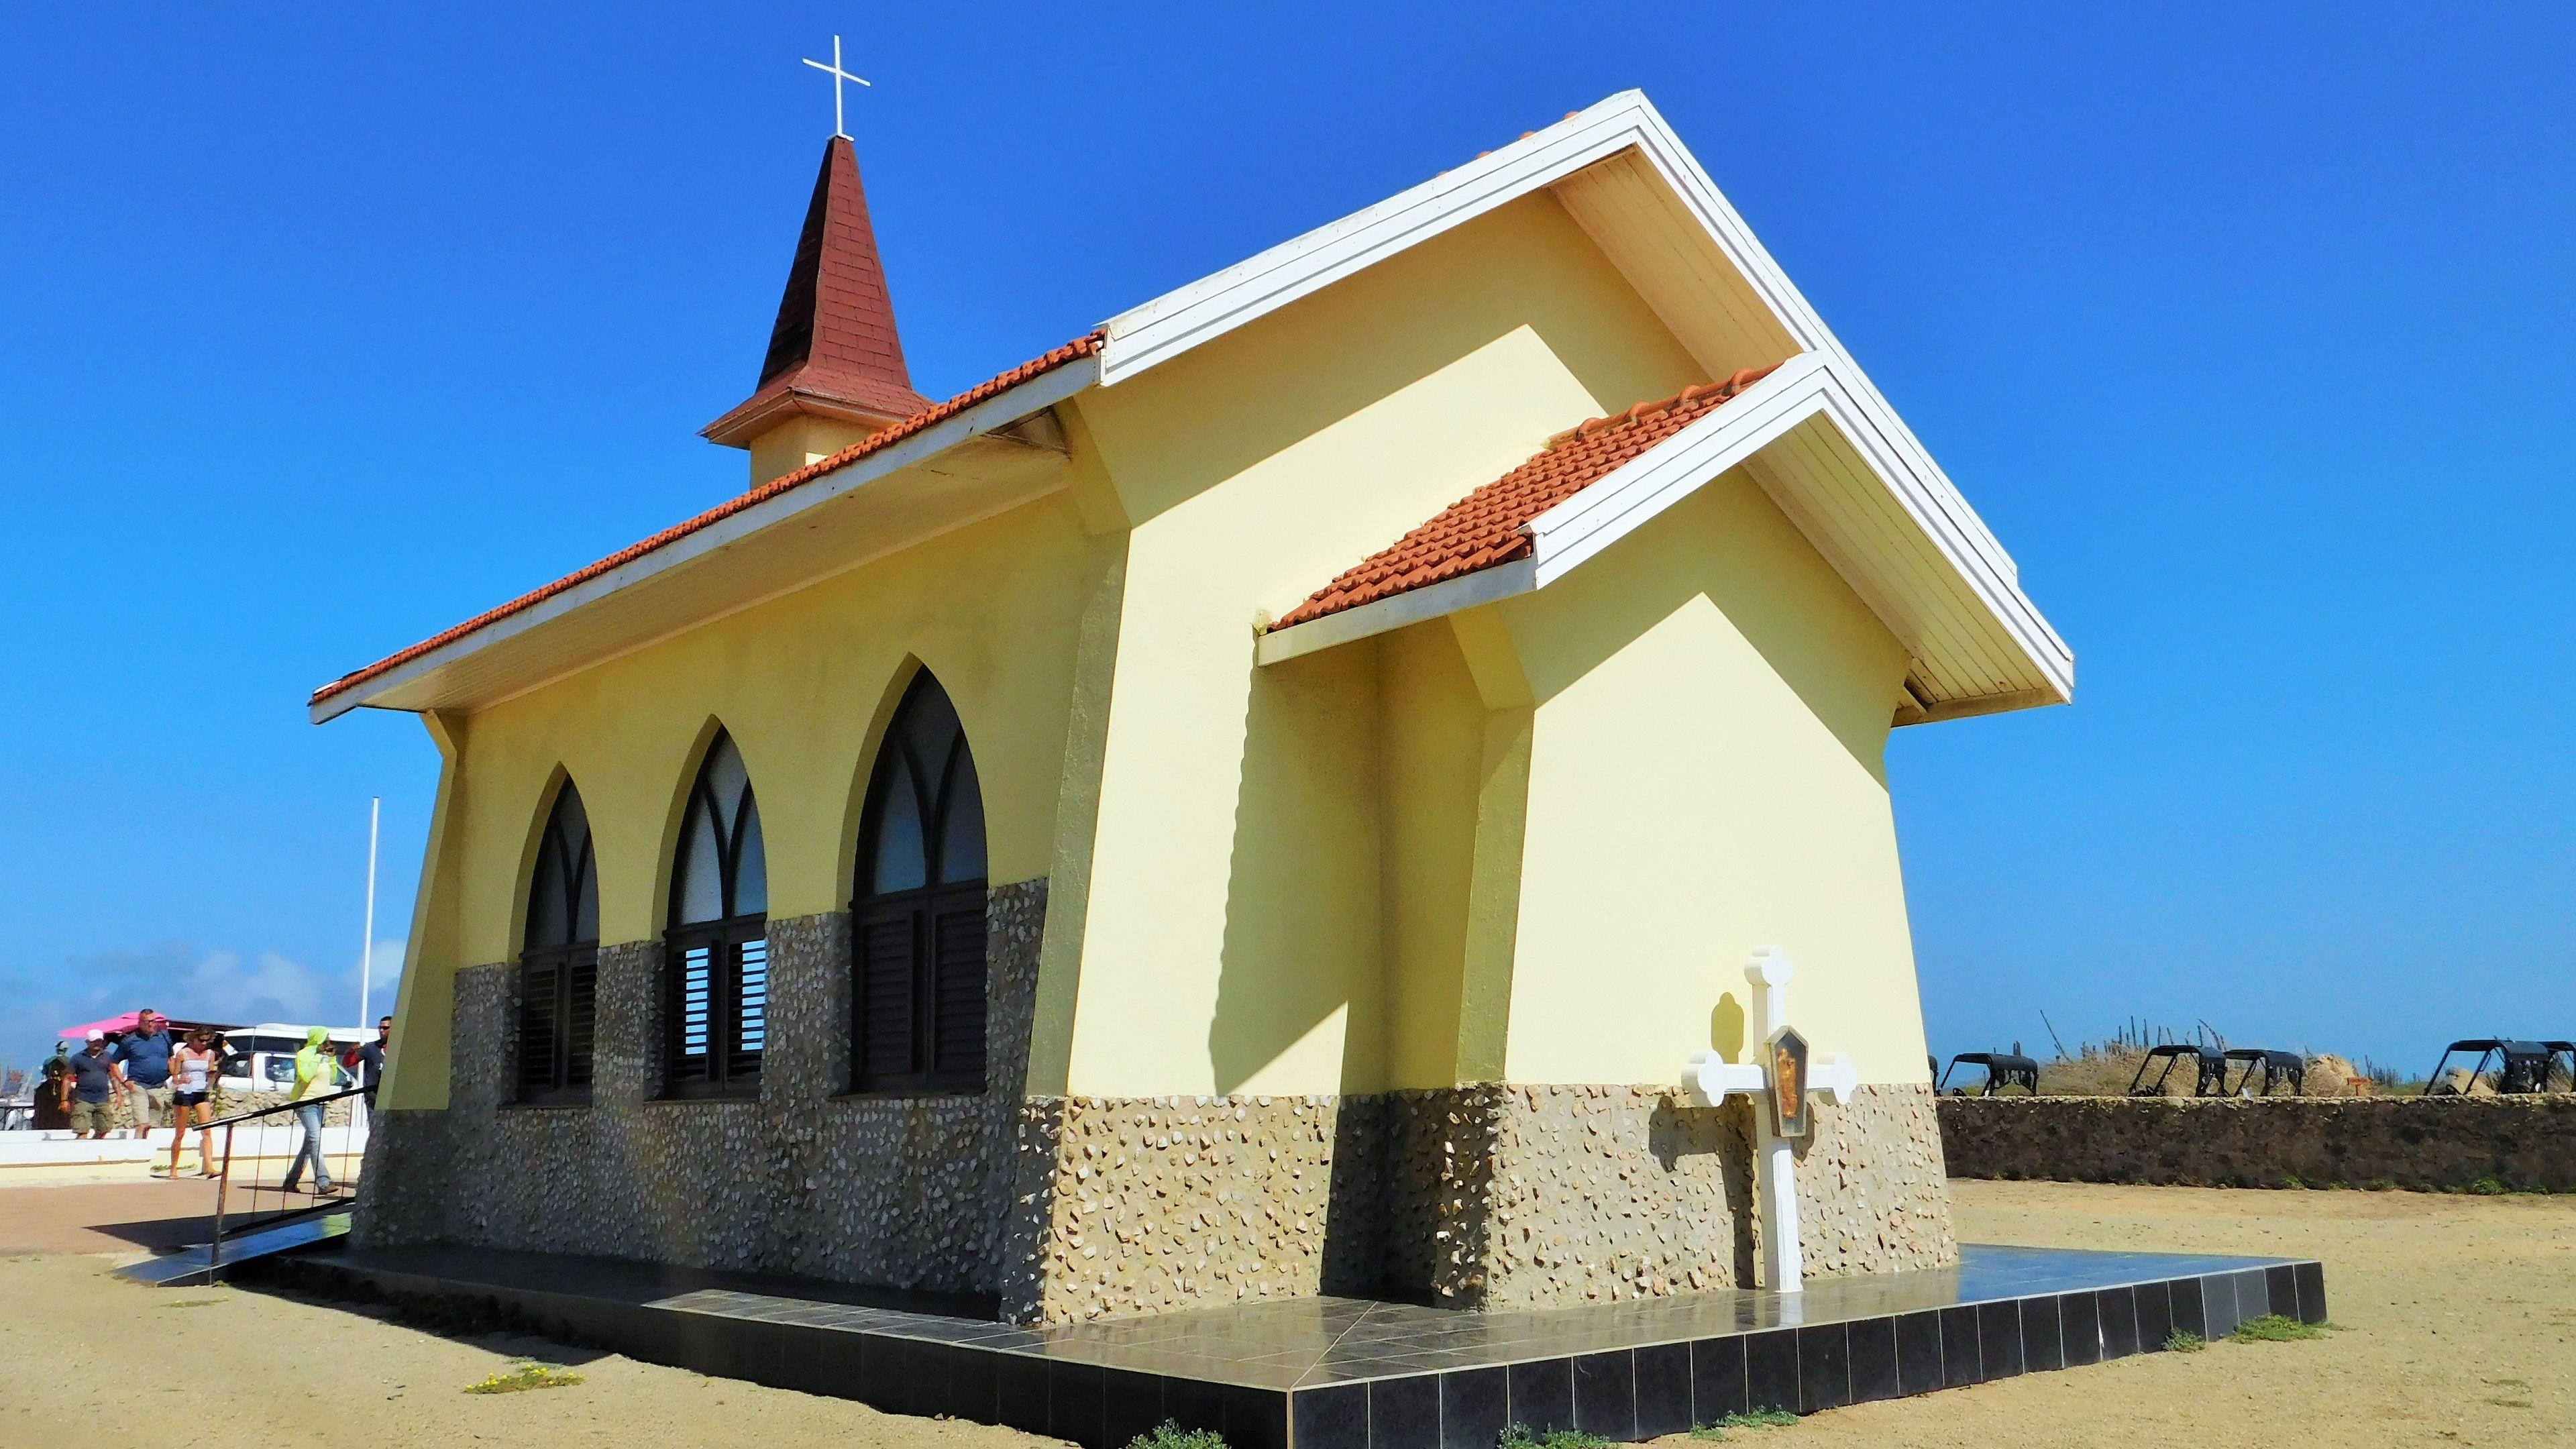 Small cathedral in Aruba